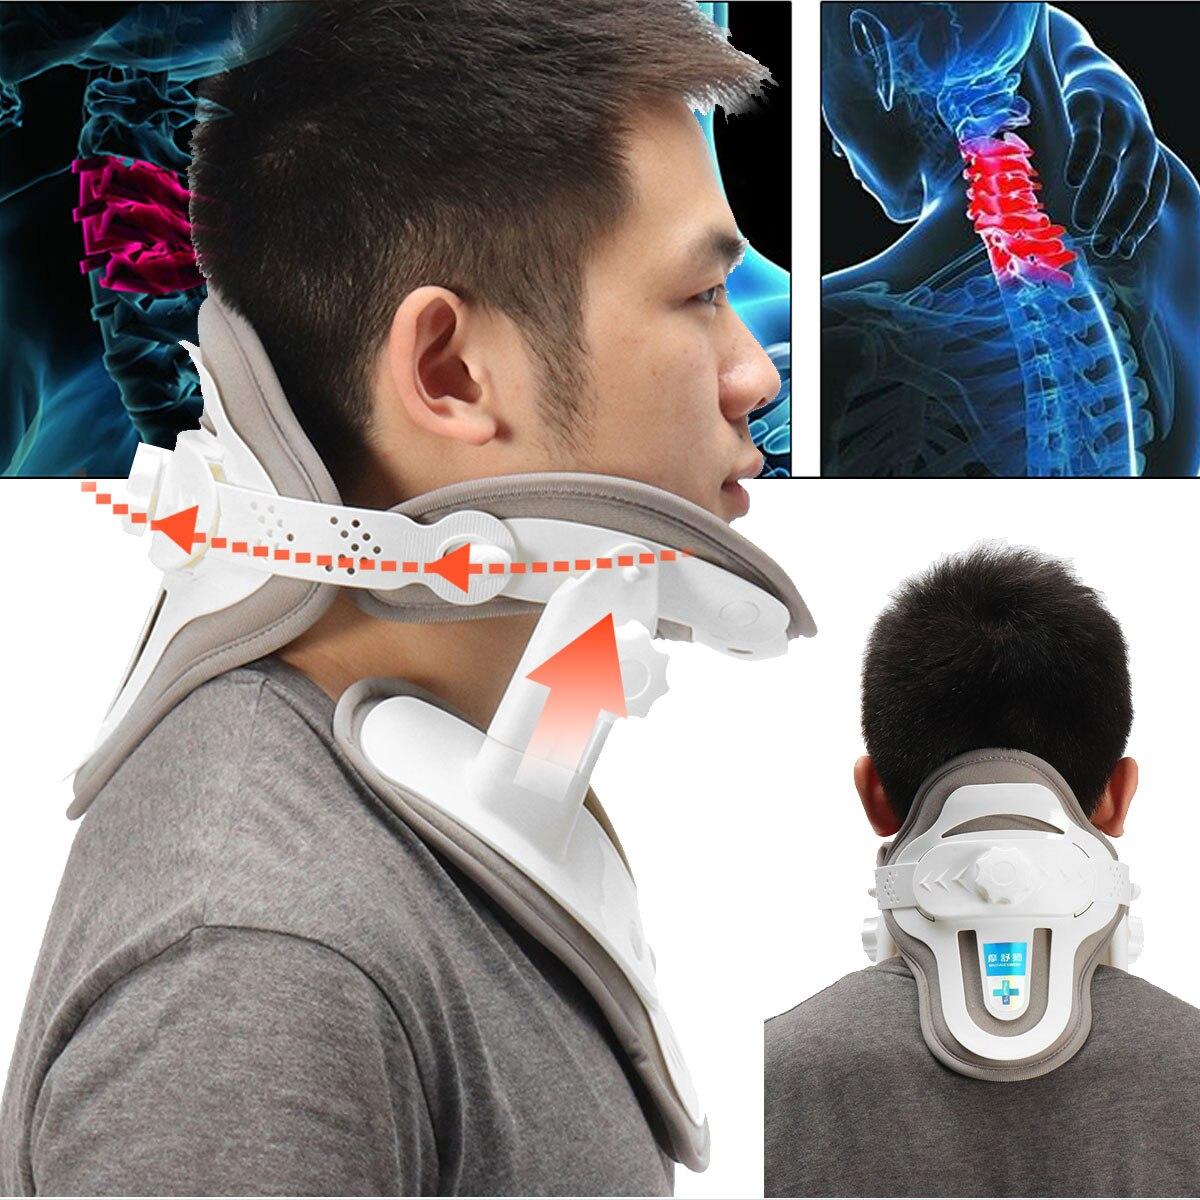 Household Adjustable Neck Brace Stretched Cervical Traction Inflatable Spondylosis Orthopedic Neck Collar Stretch Machine